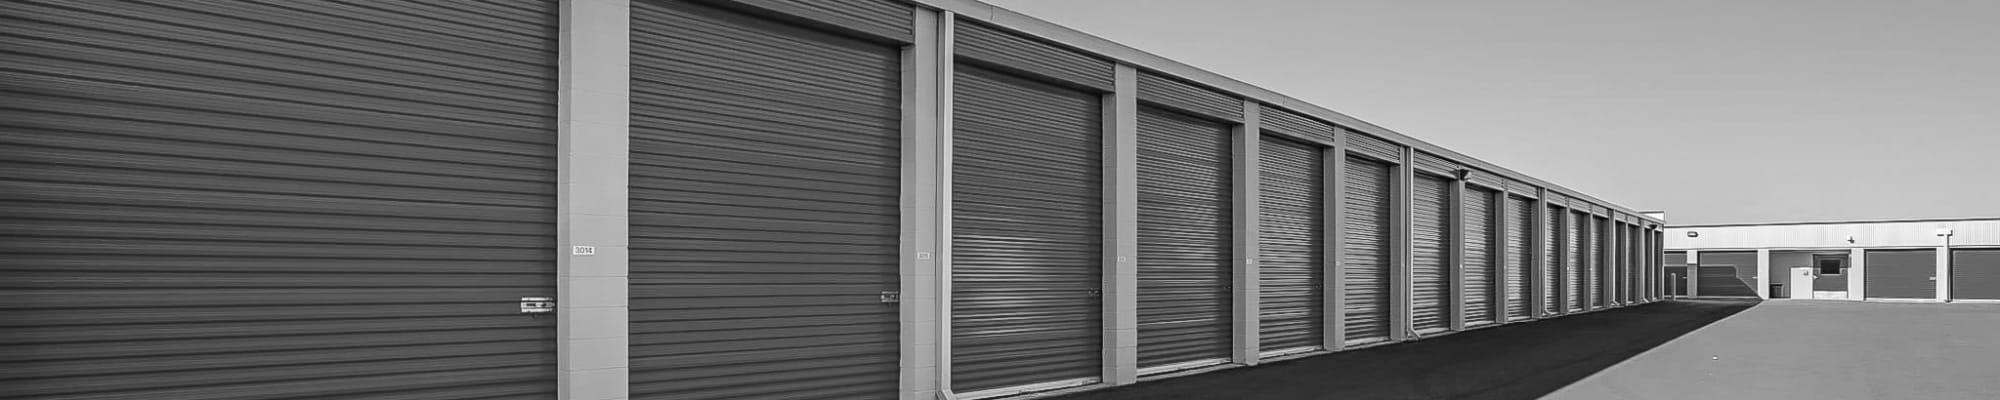 Find a location at 180 Self-Storage in Gilbert, Arizona